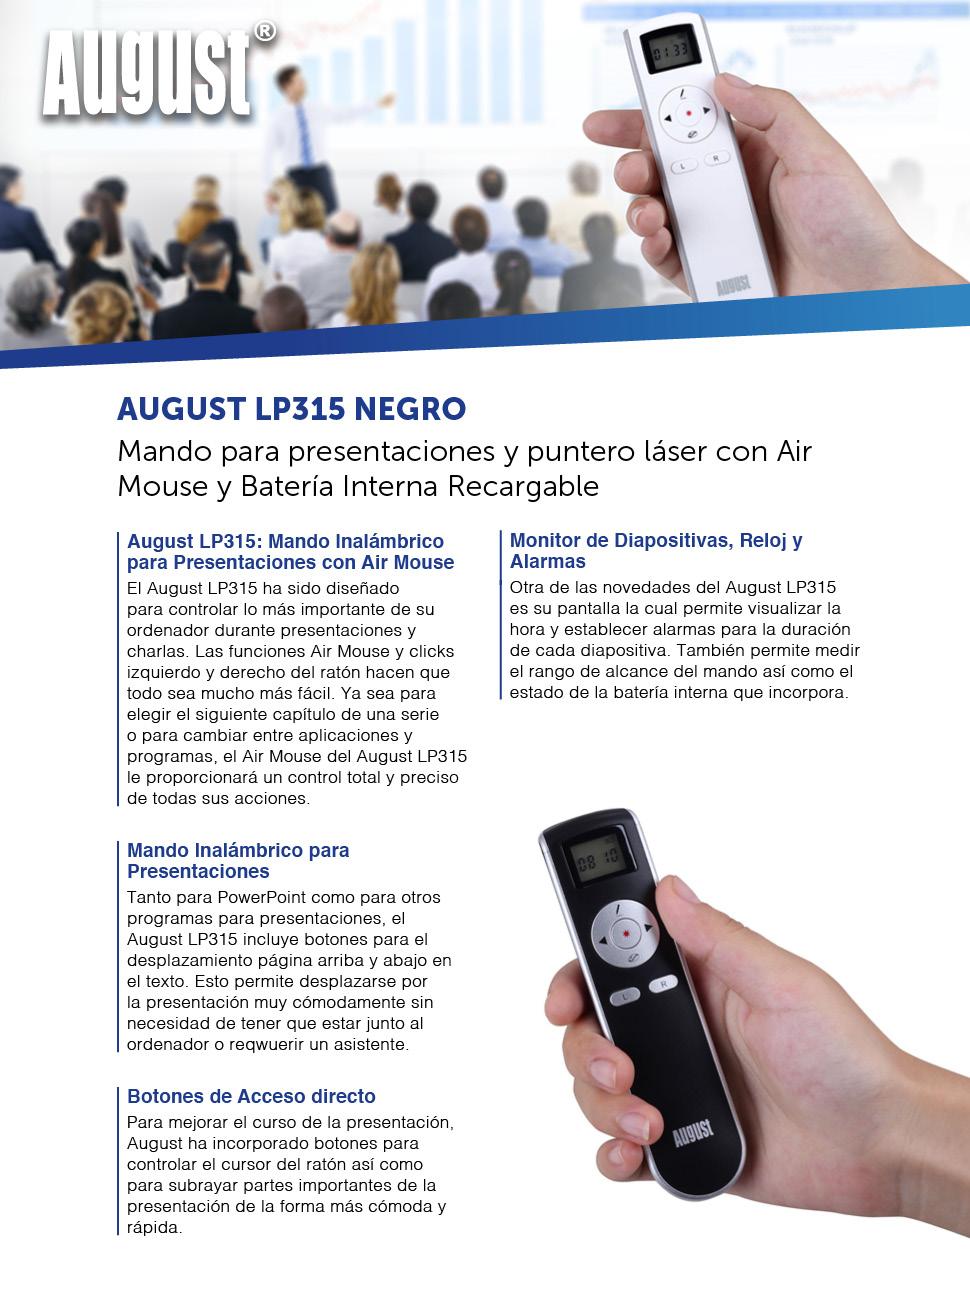 August LP315 - Mando para presentaciones con puntero - Mando inalámbrico con Air Mouse y Batería Interna Recargable - Diapositivas Powerpoint - ...